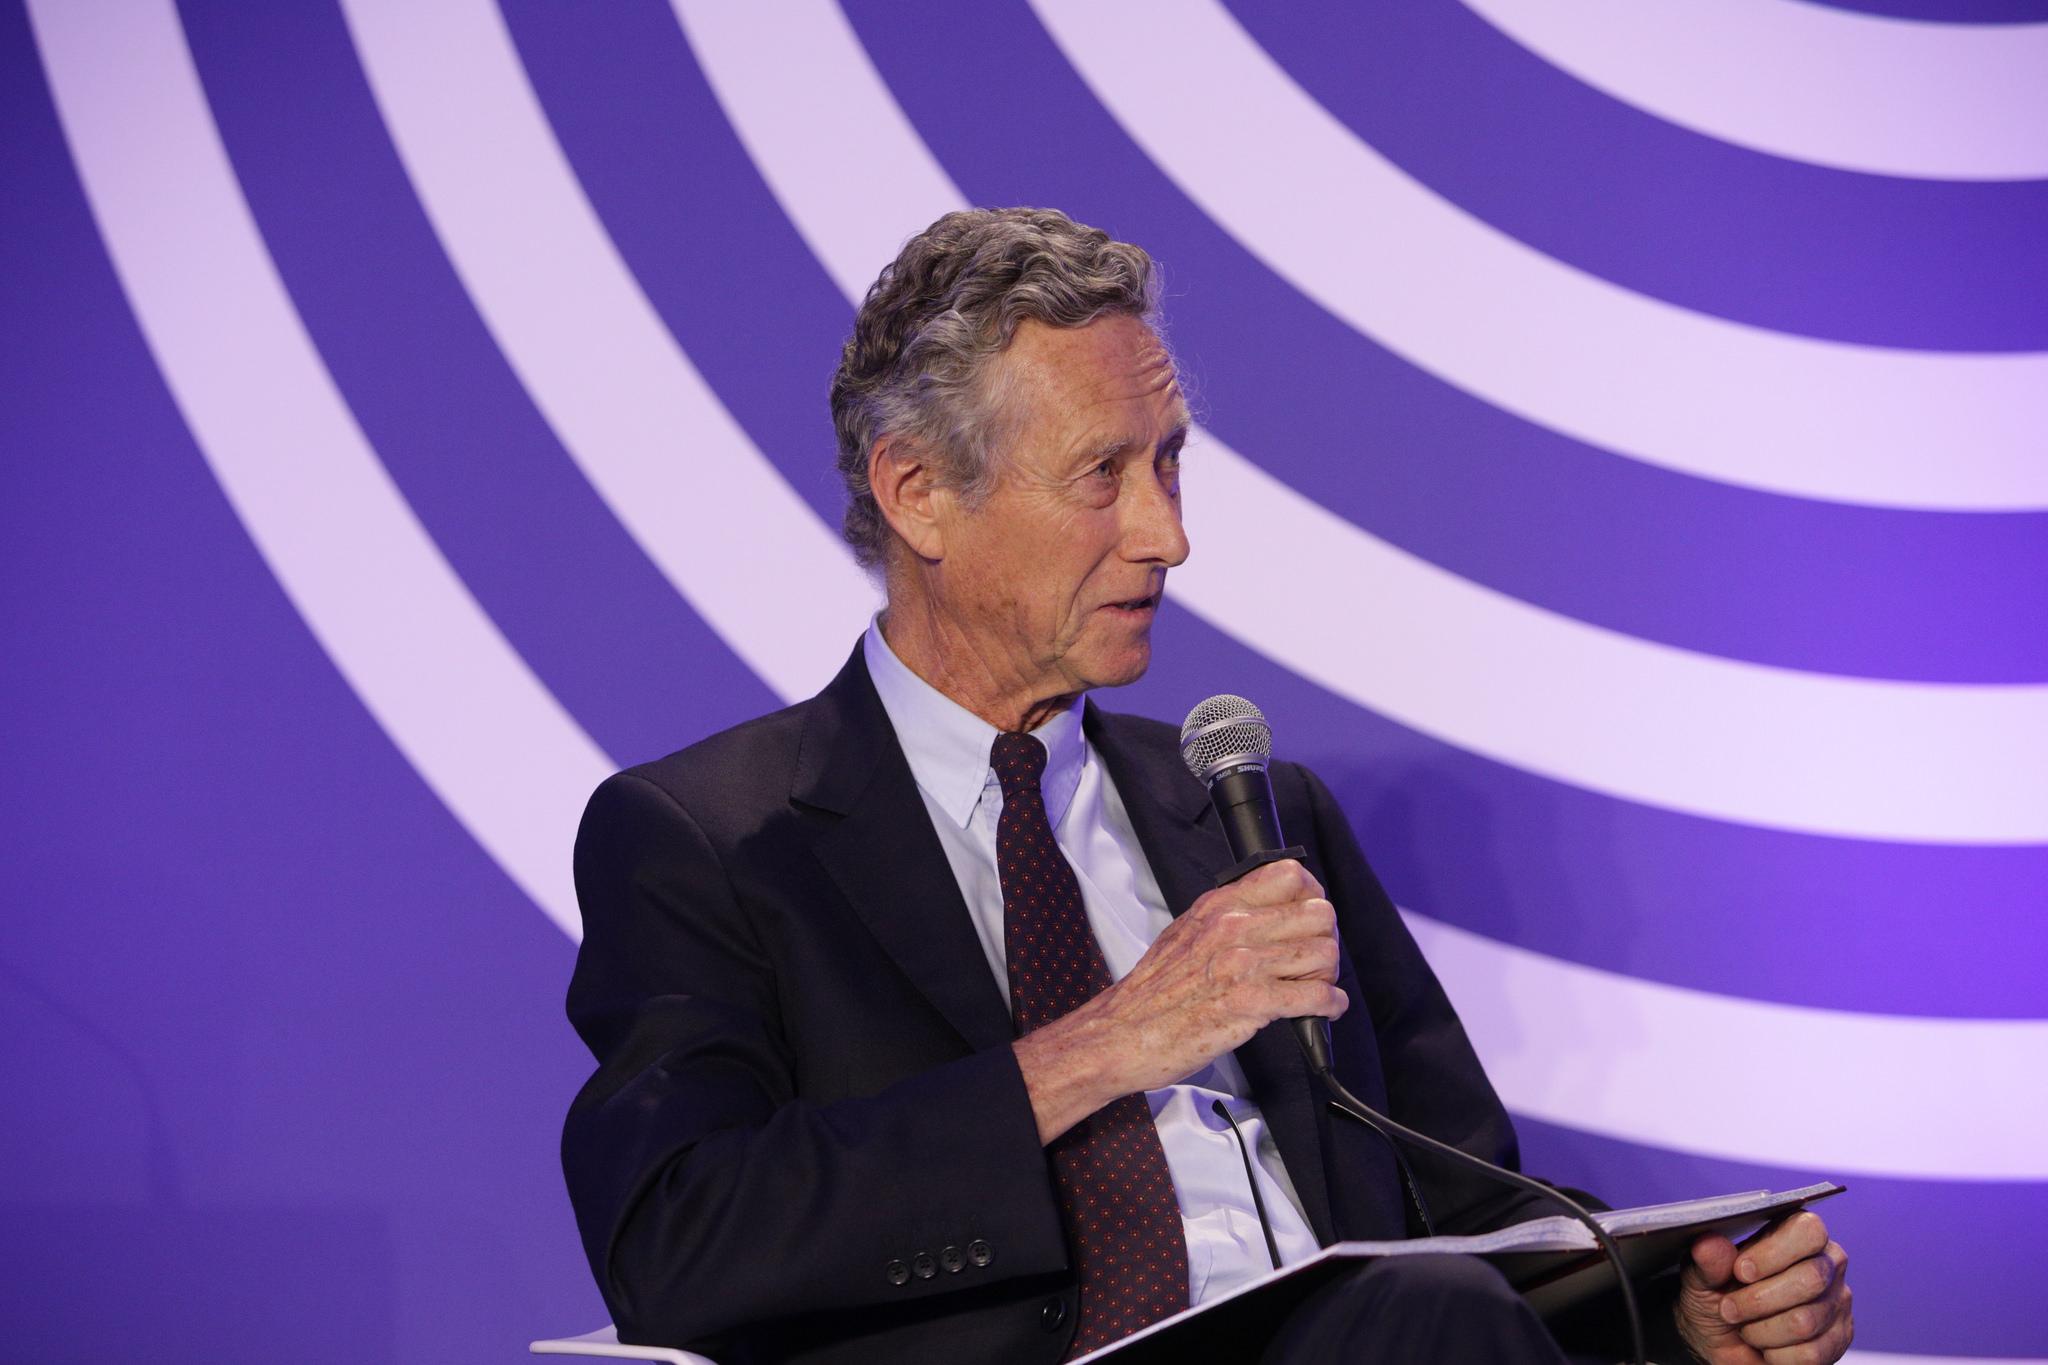 Olivier Blanchard, Professor at MIT Department of Economics